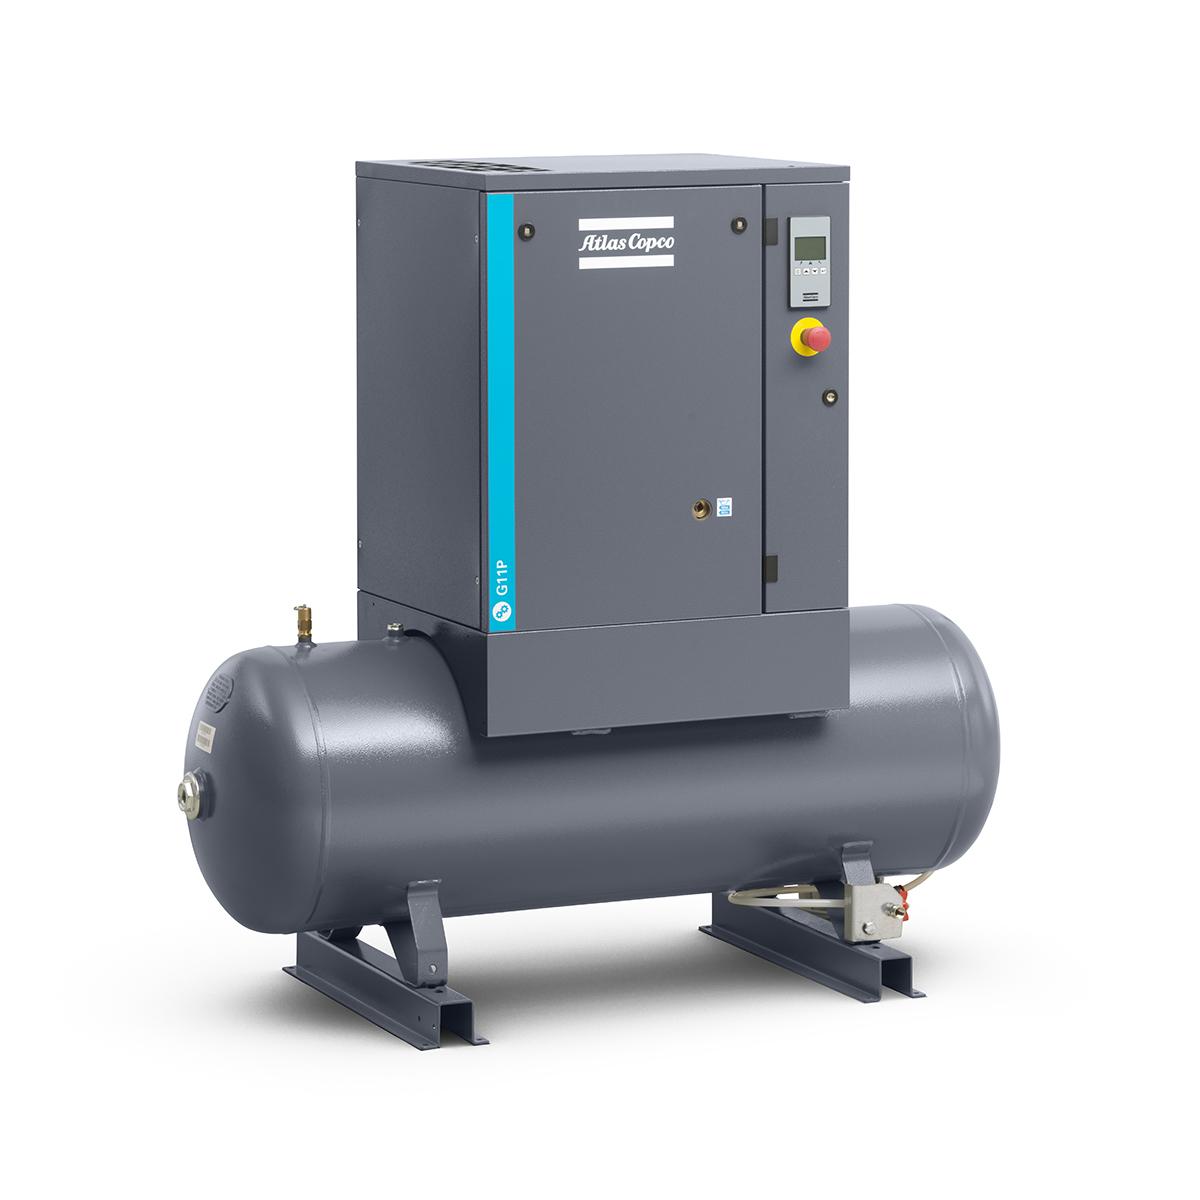 Screw Air Compressor - Model 11kW Screw Compressor G11P 7.5 BAR